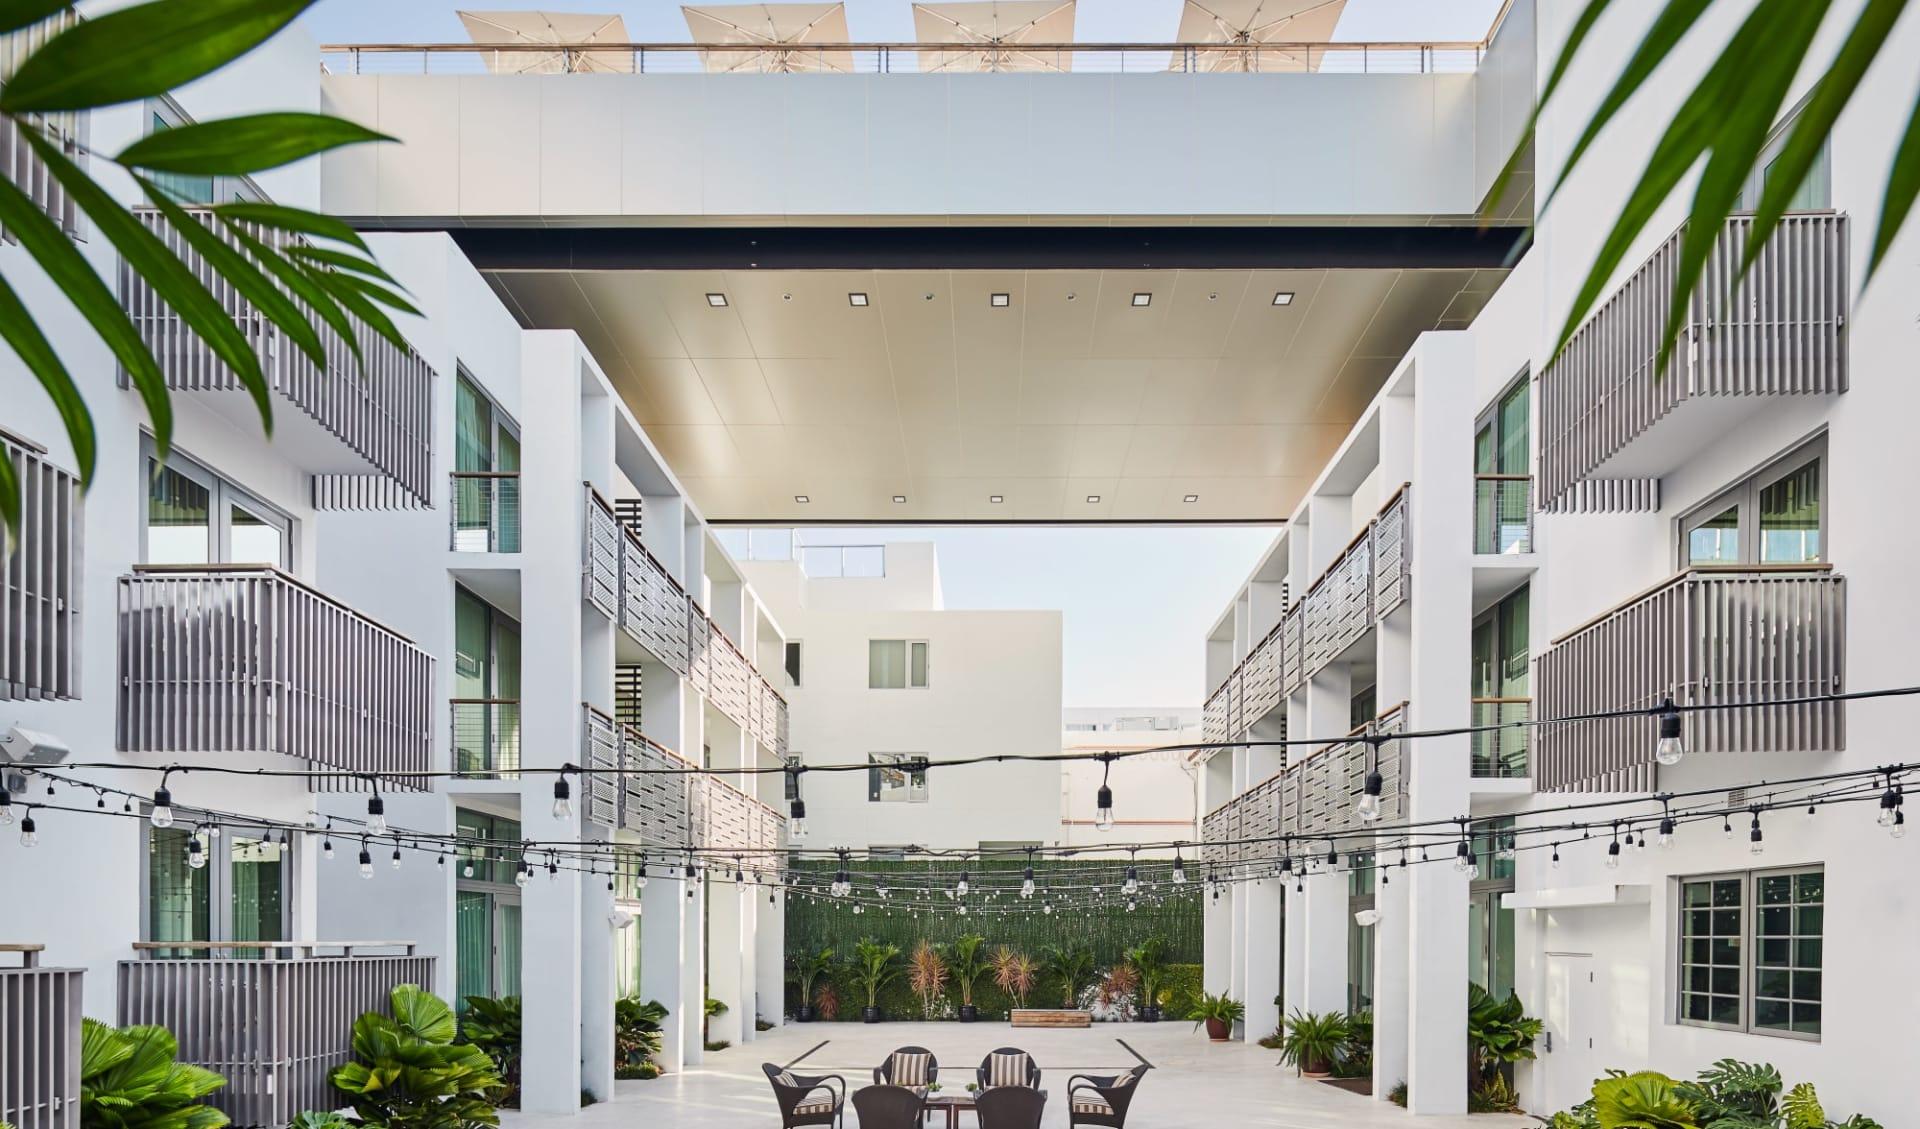 The Betsy South Beach in Miami Beach:  The Betsy - Atrium